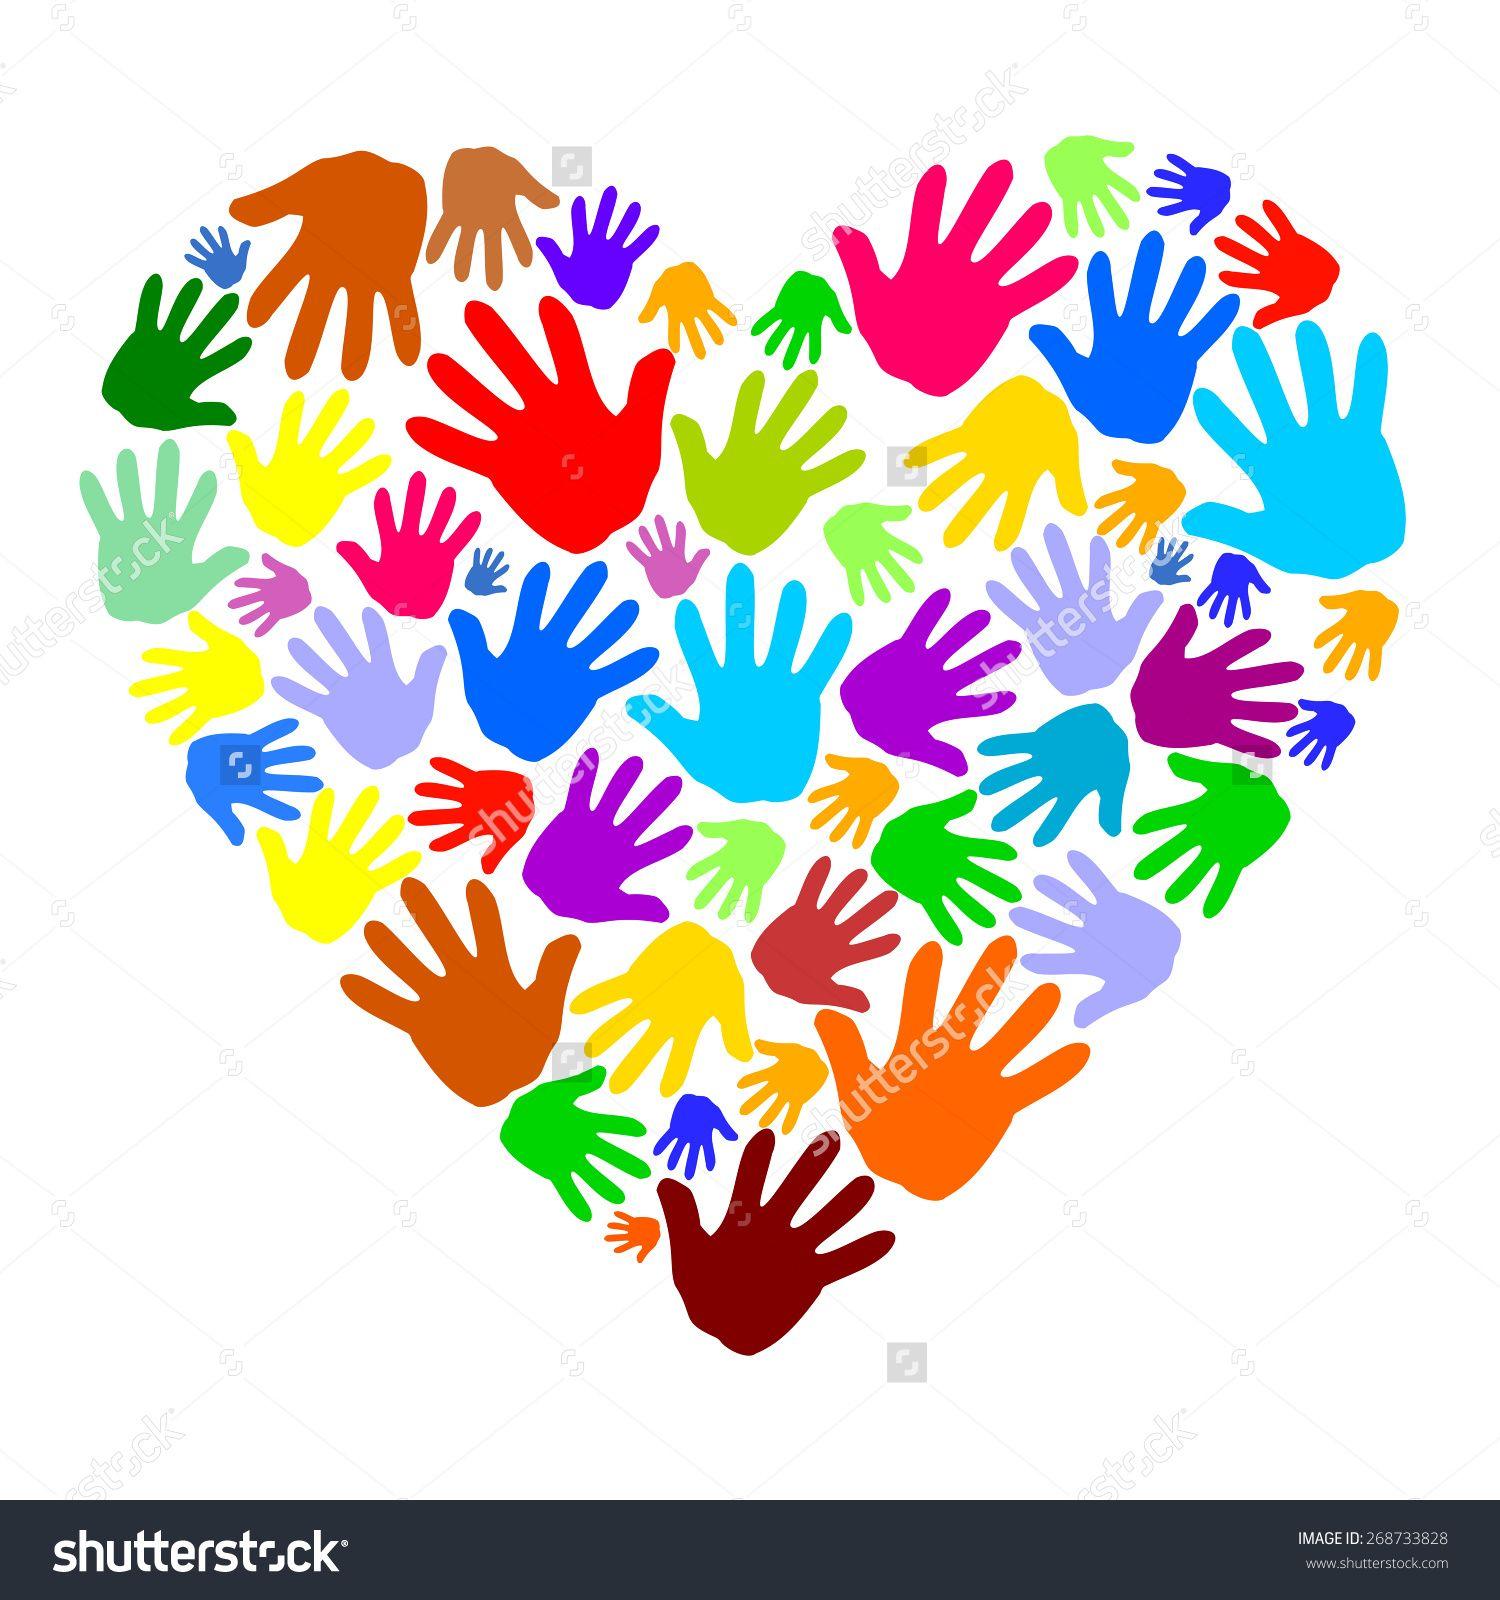 Logo stock images similar. Handprint clipart heart